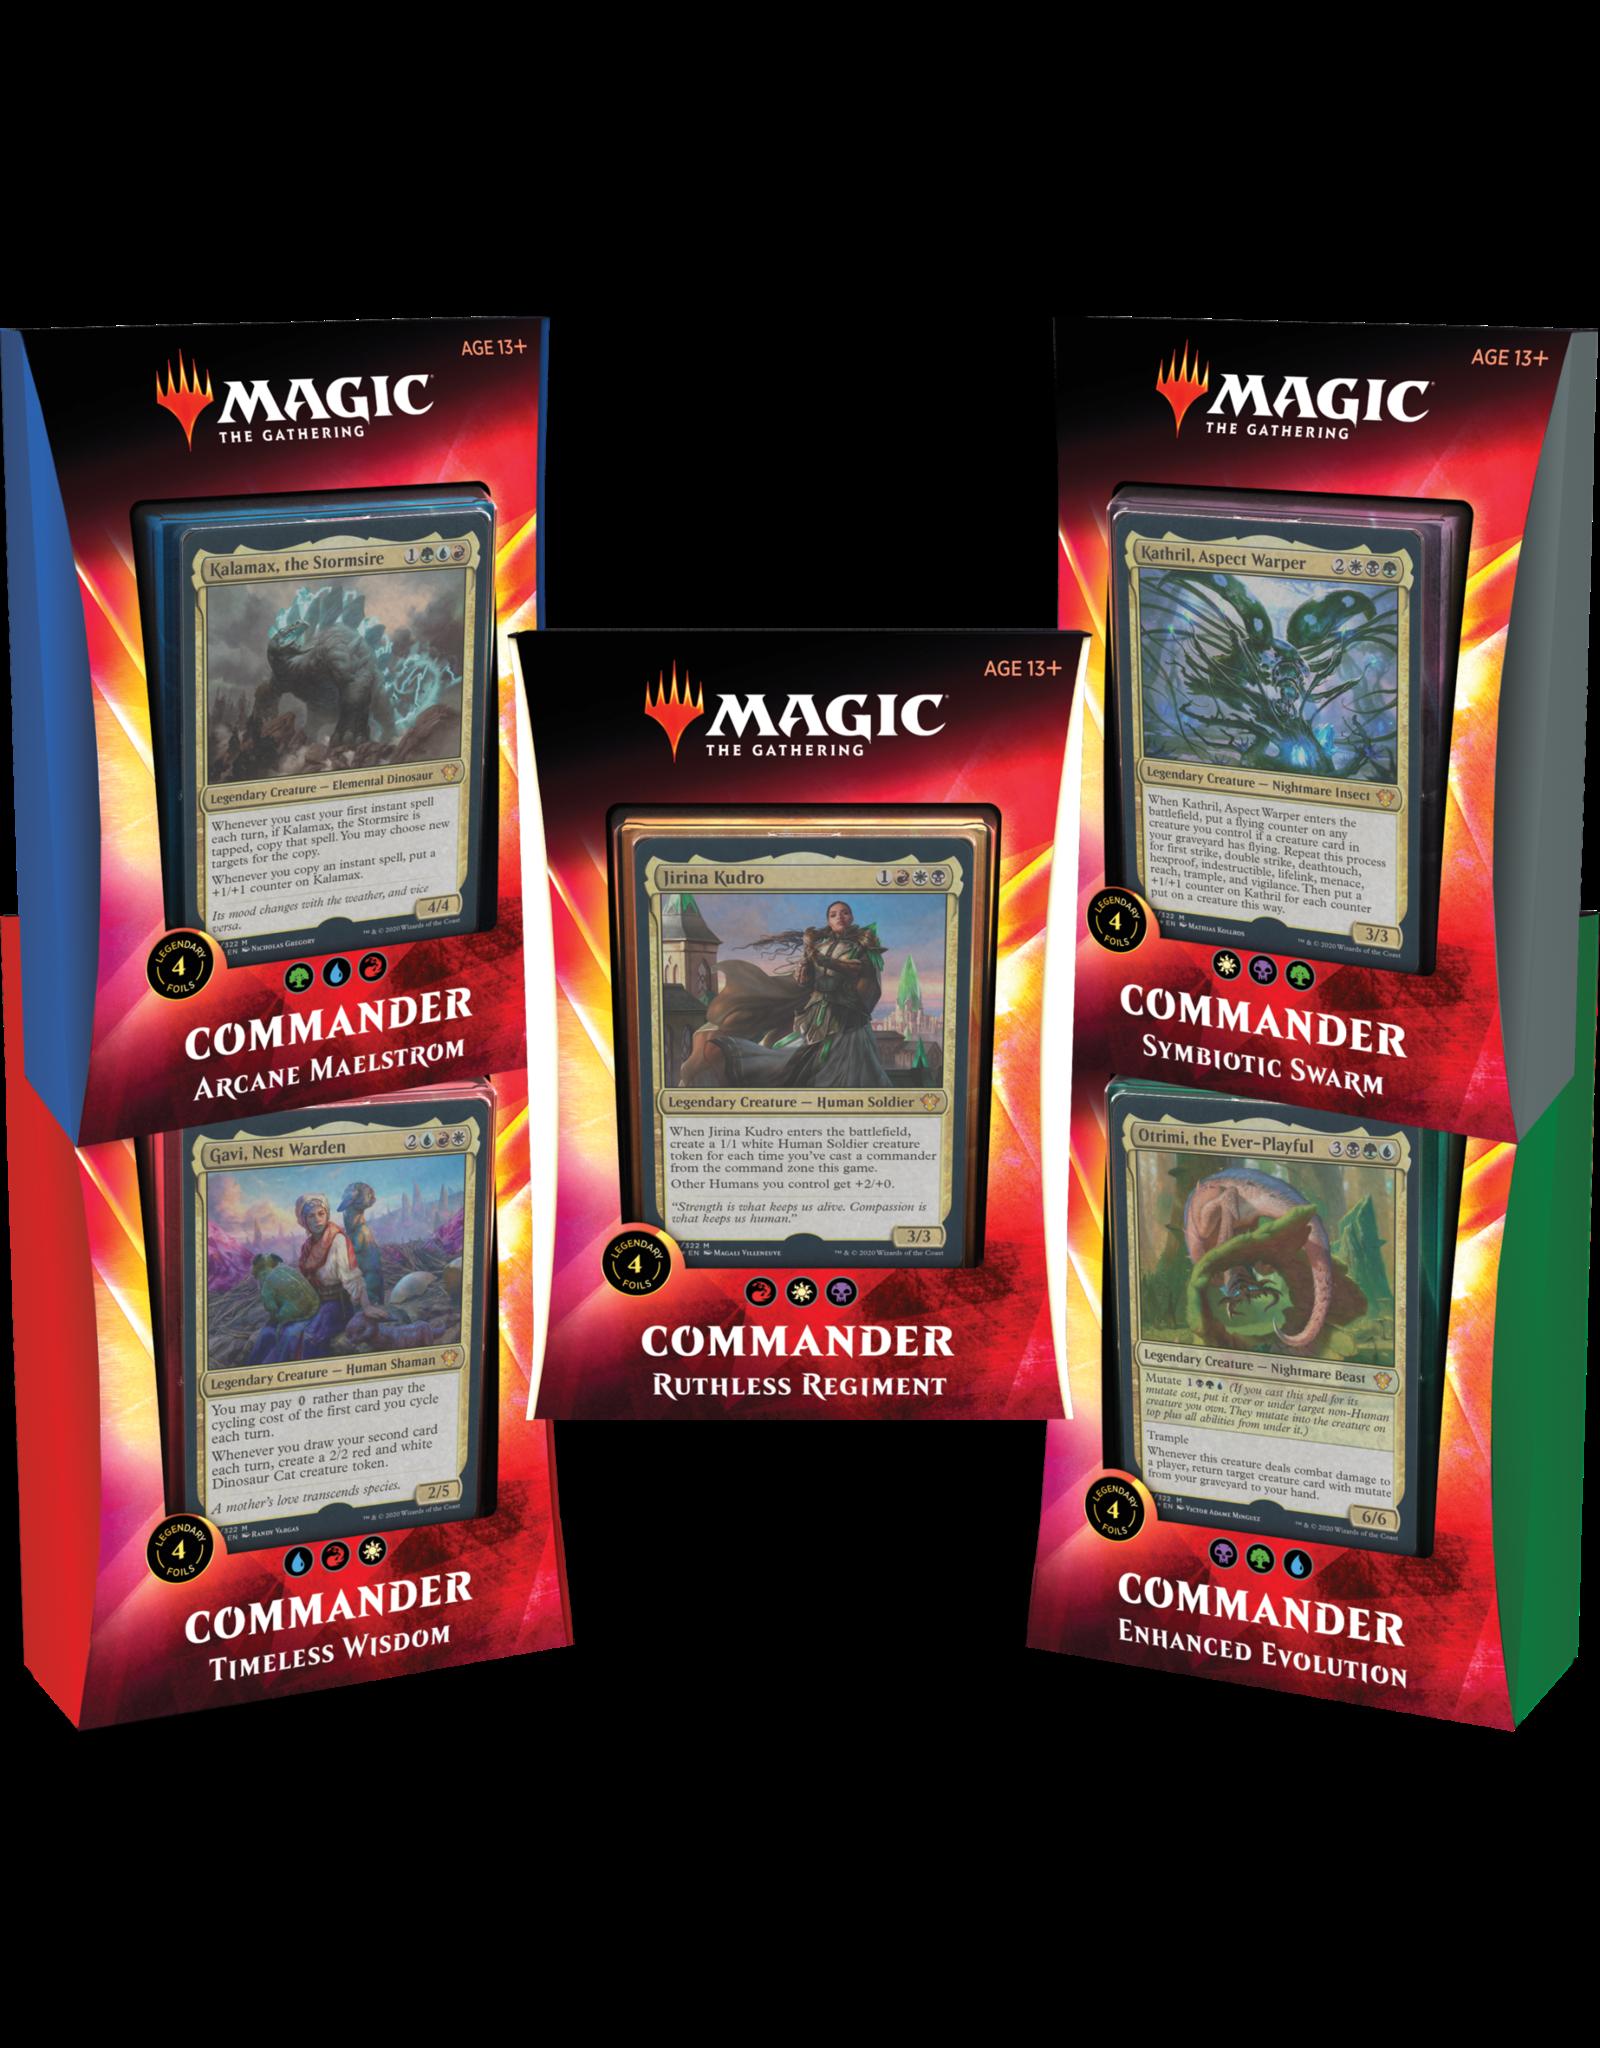 Magic: The Gathering Magic: The Gathering - Ikoria: Lair of Behemoths - Commander Decks